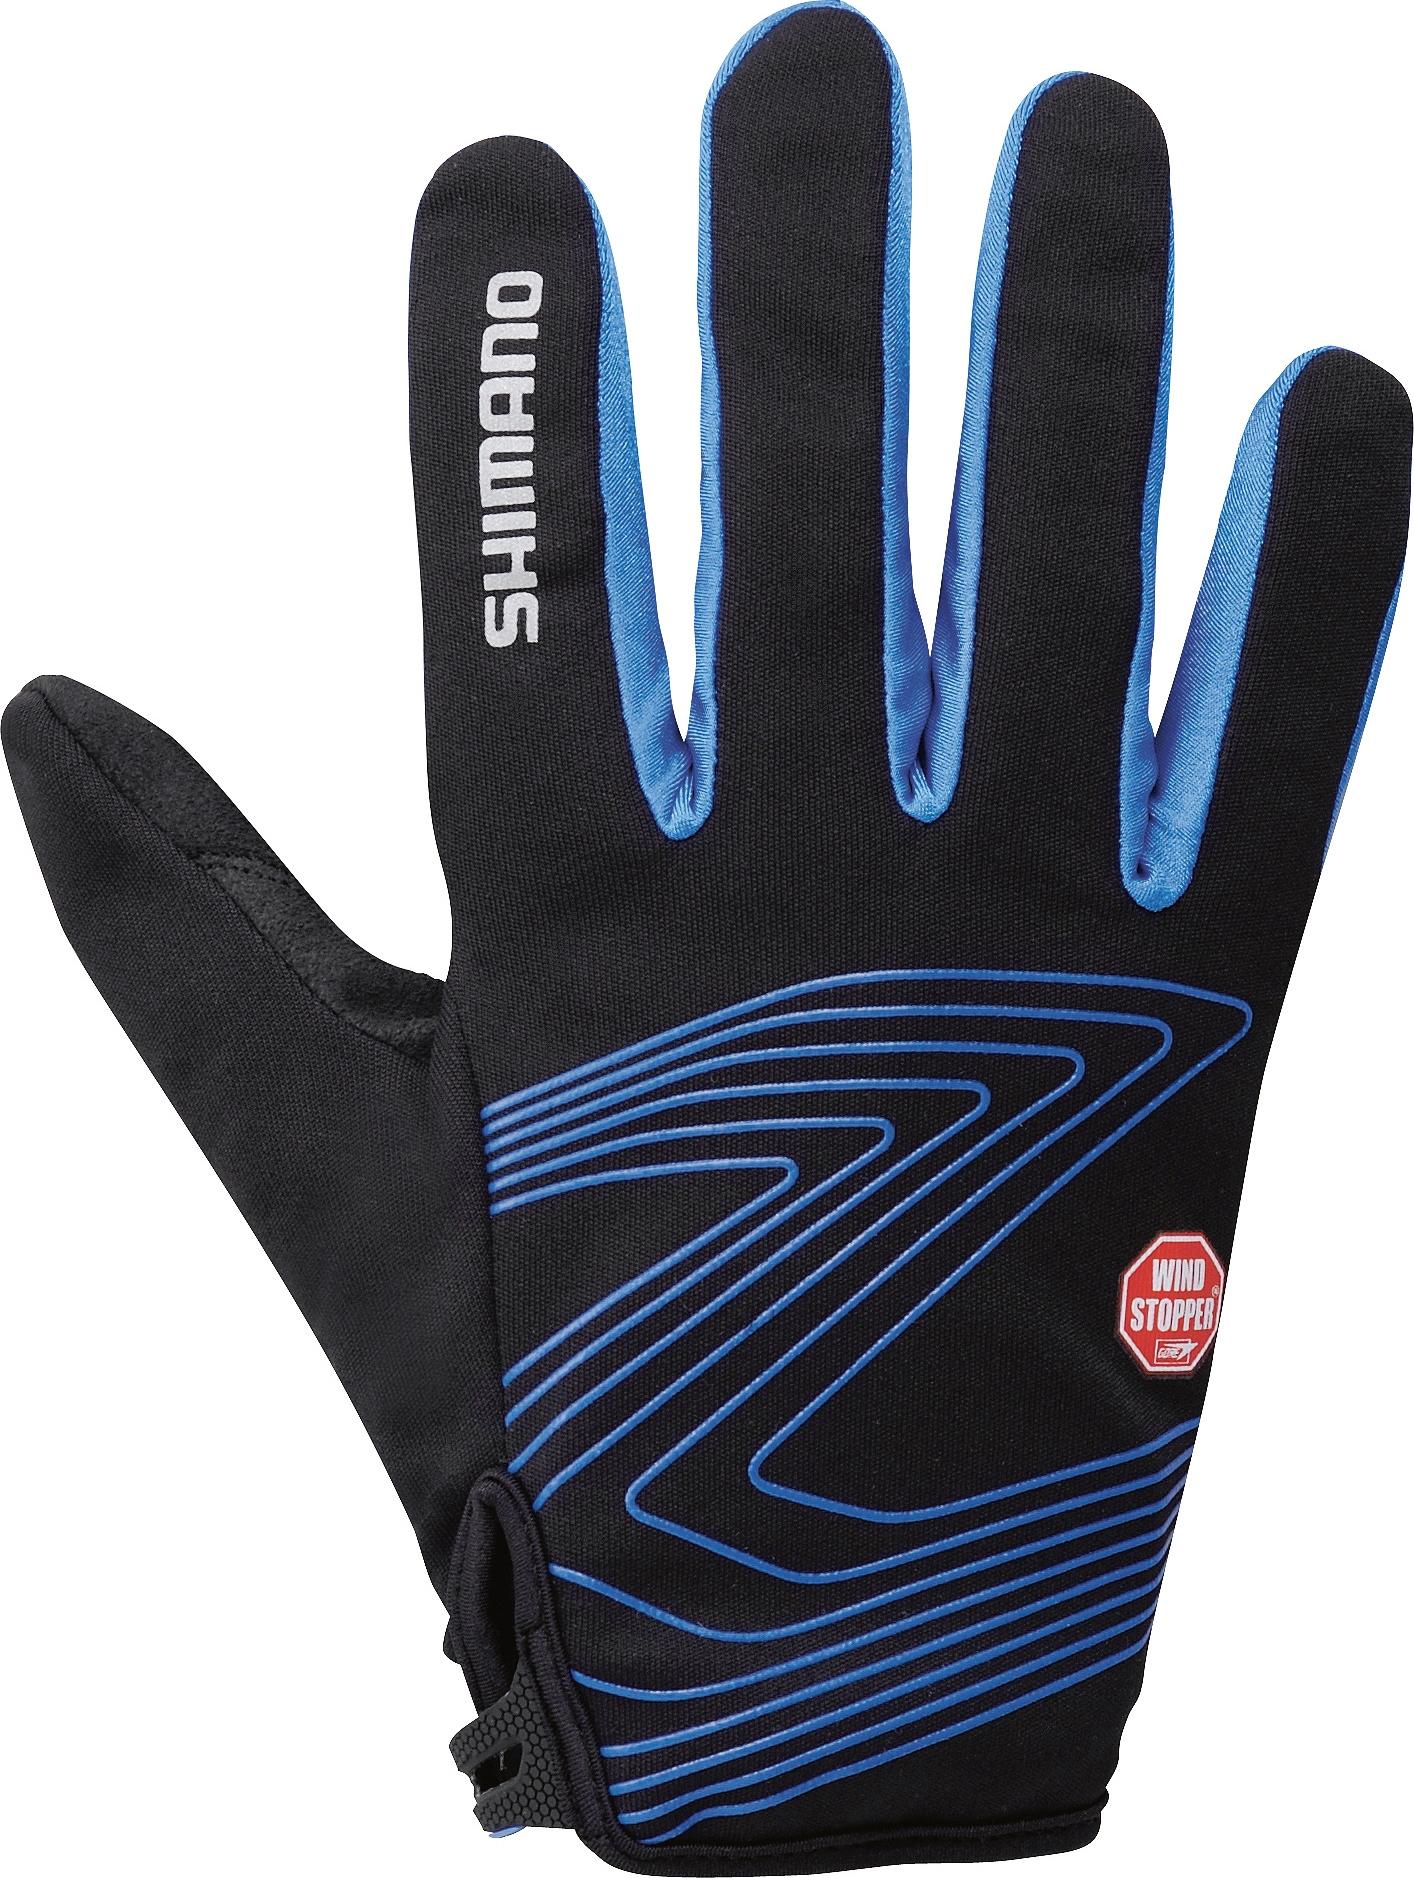 shimano windstopper thin handschuhe blau kaufen. Black Bedroom Furniture Sets. Home Design Ideas